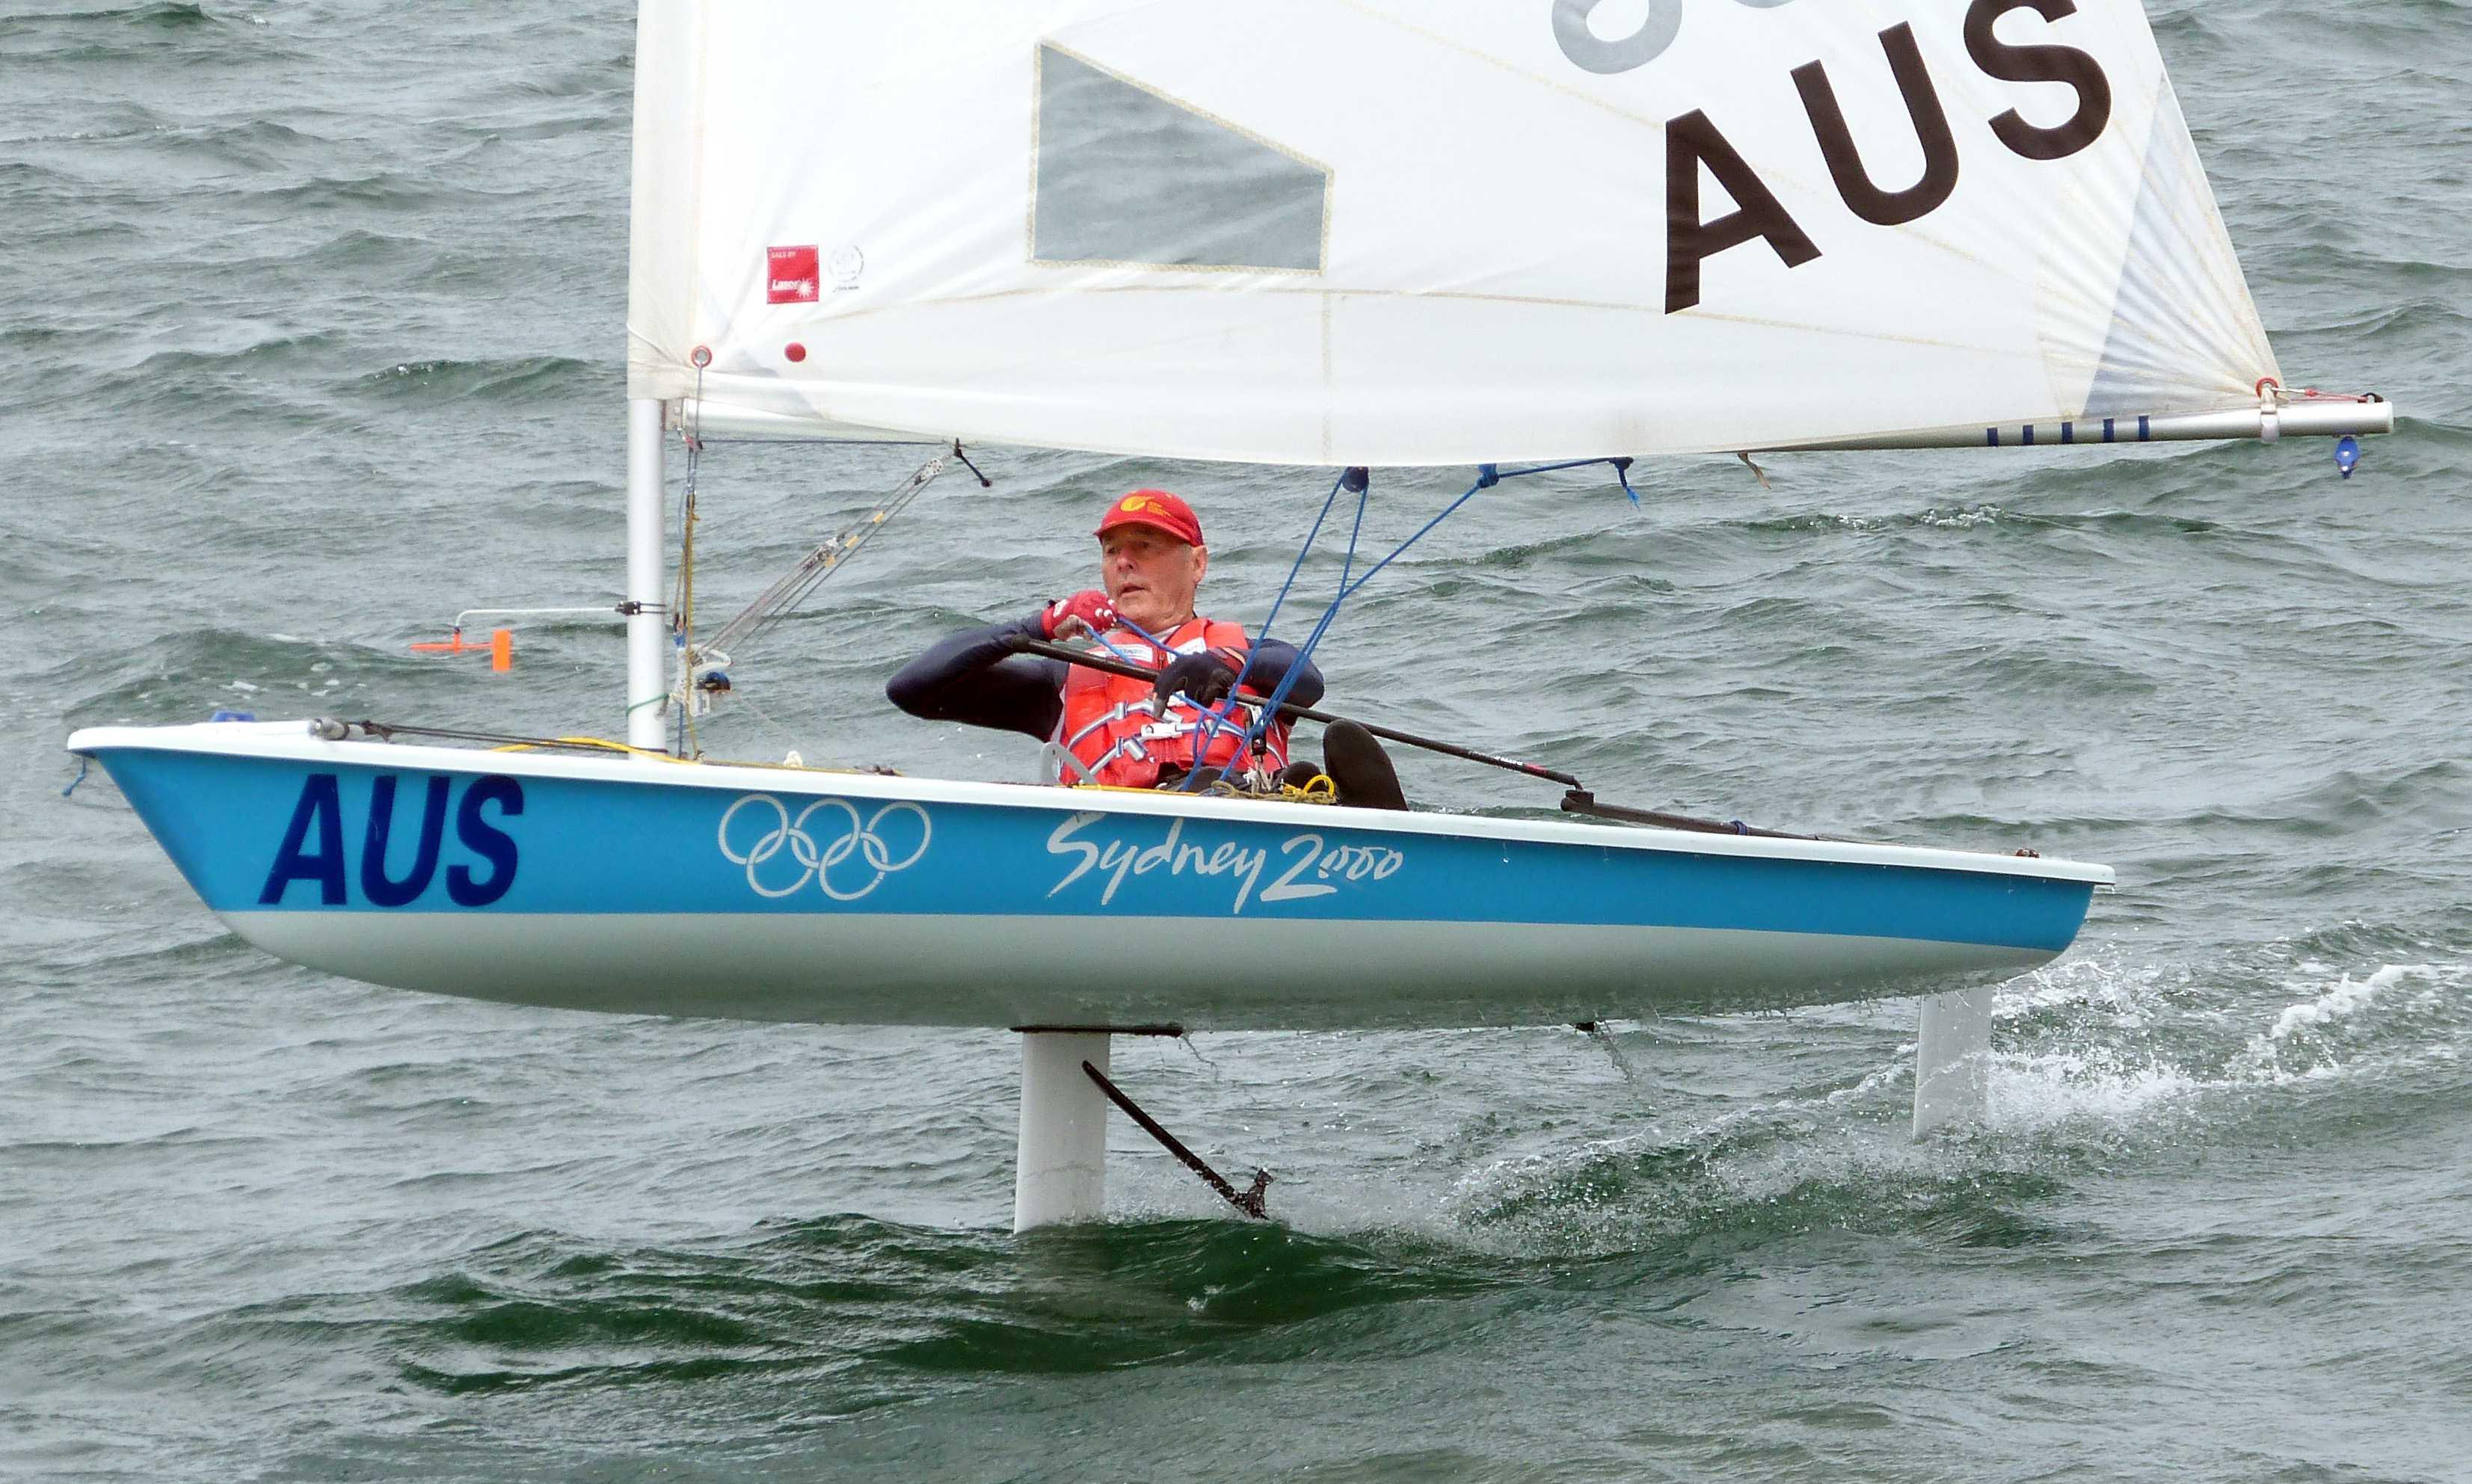 Hydrofoils cruising into the sailing world